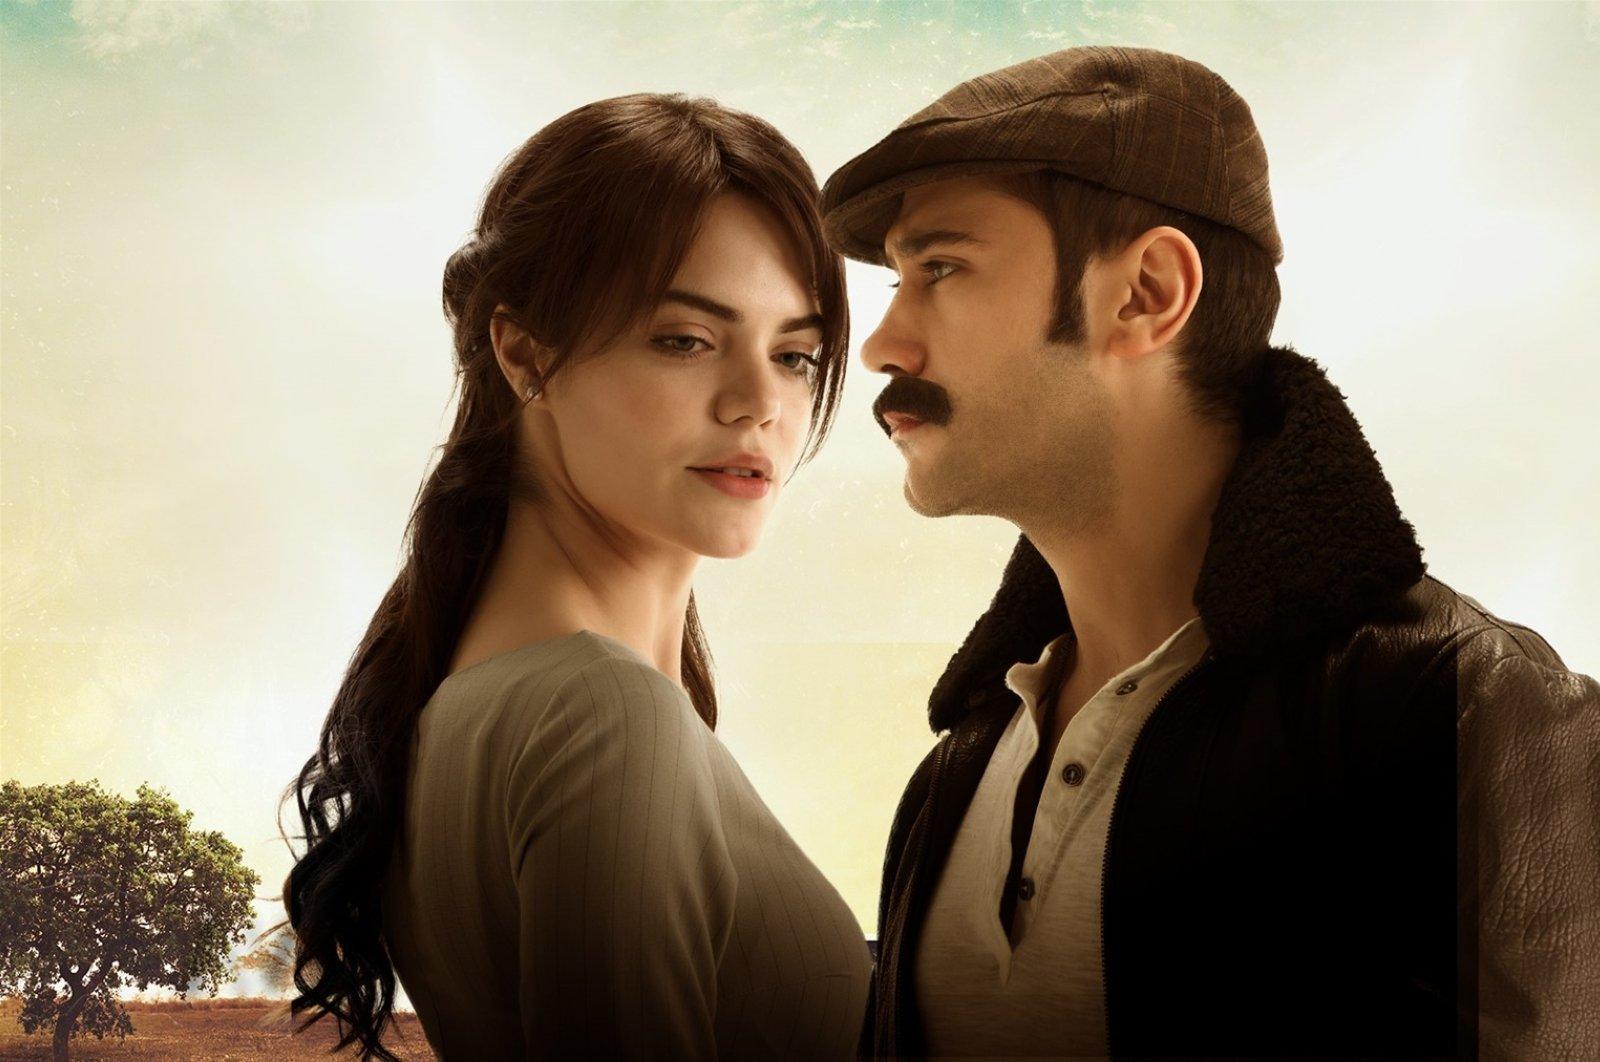 """Bir Zamanlar Çukurova""  is aired on MTV, one of the leading television channels in Lebanon."